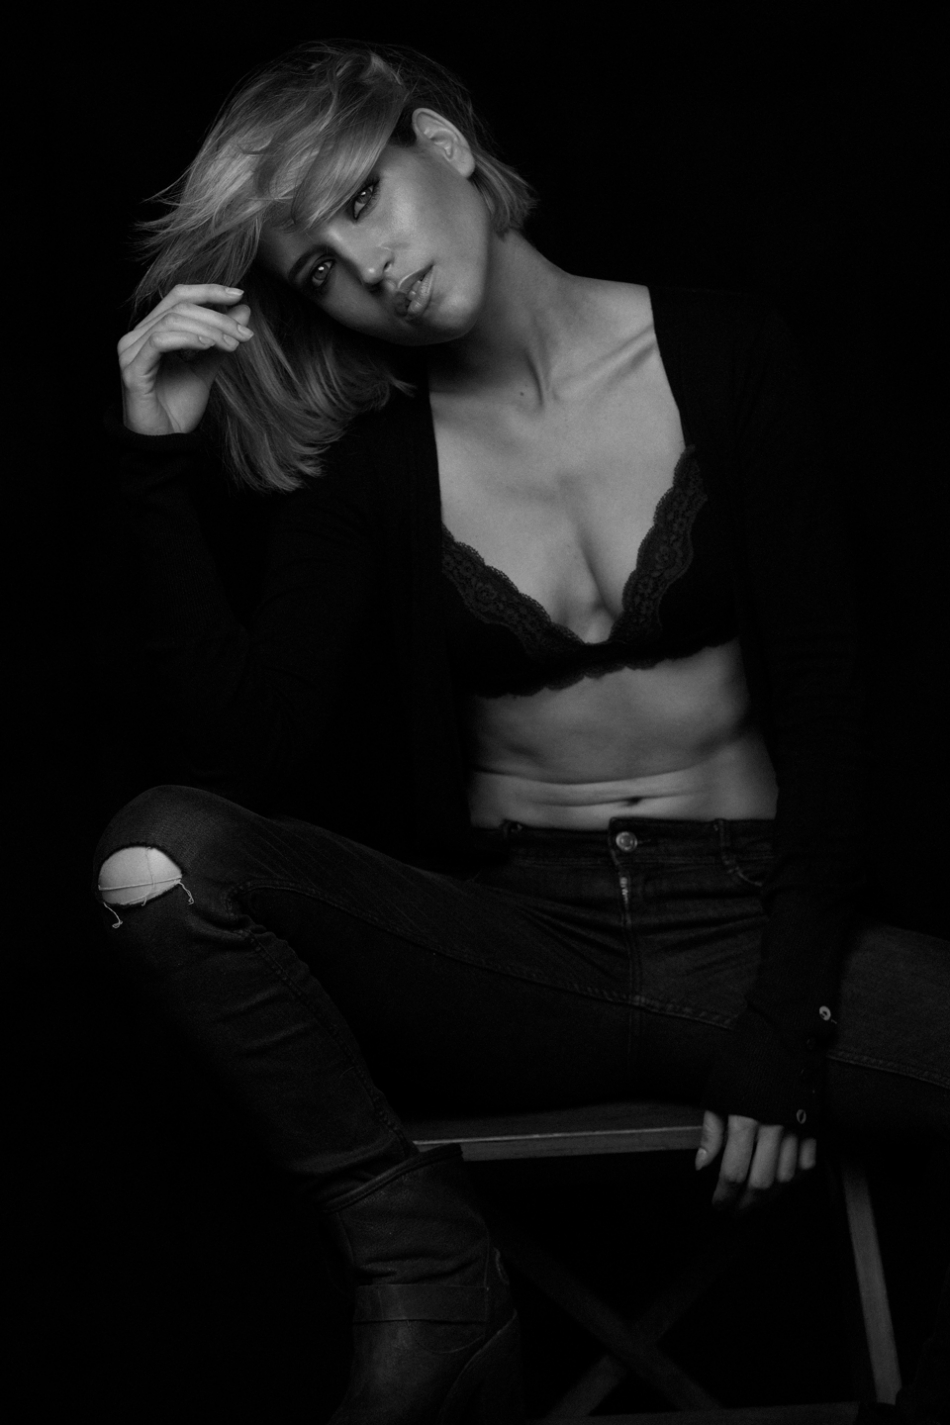 valero-rioja-photography-celebrity-ana-fernandez